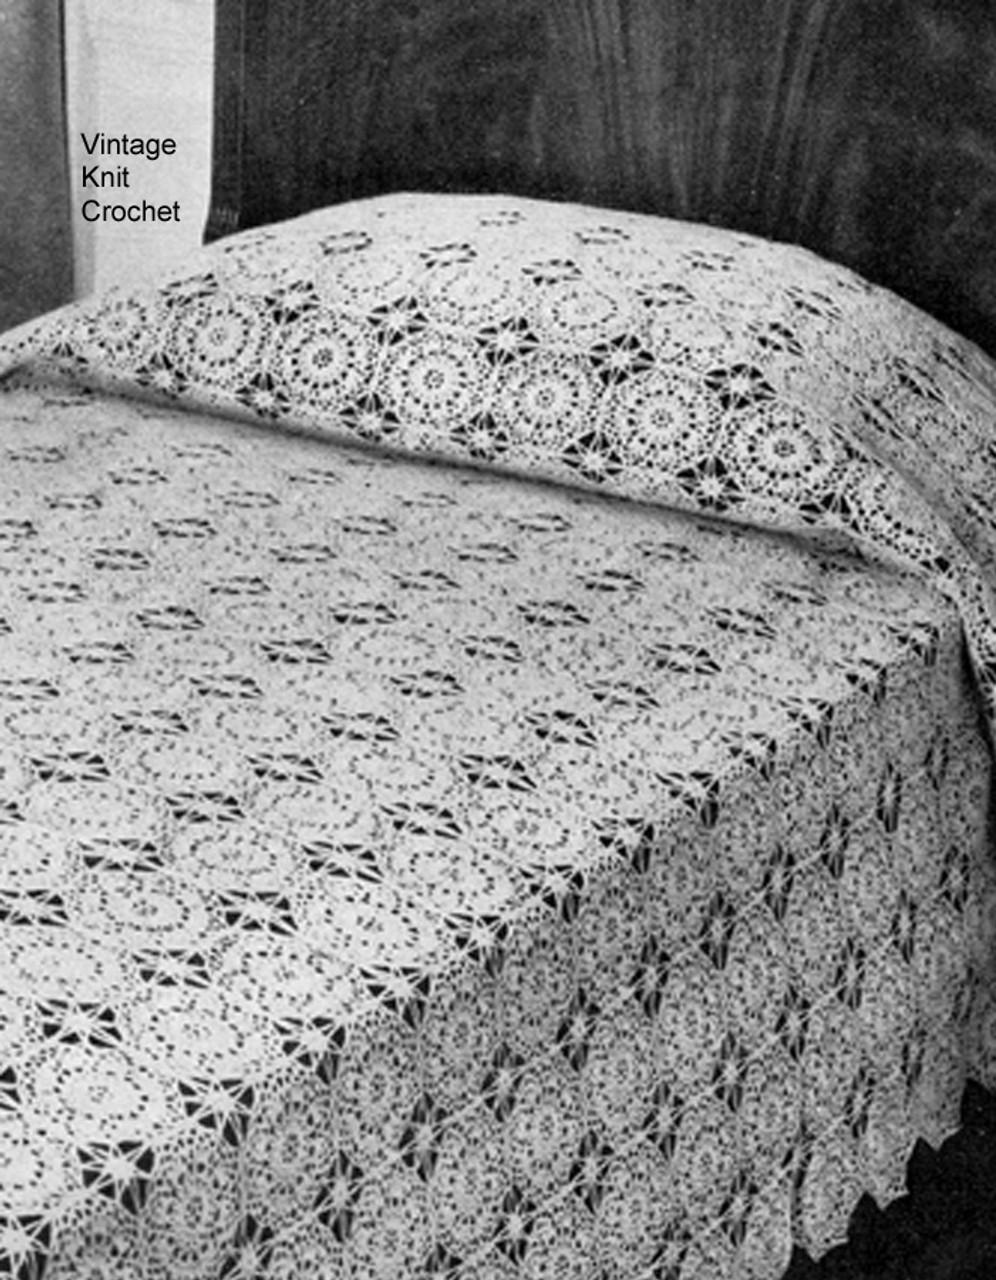 Vintage Crochet Bedspread Pattern in Circular Medallions